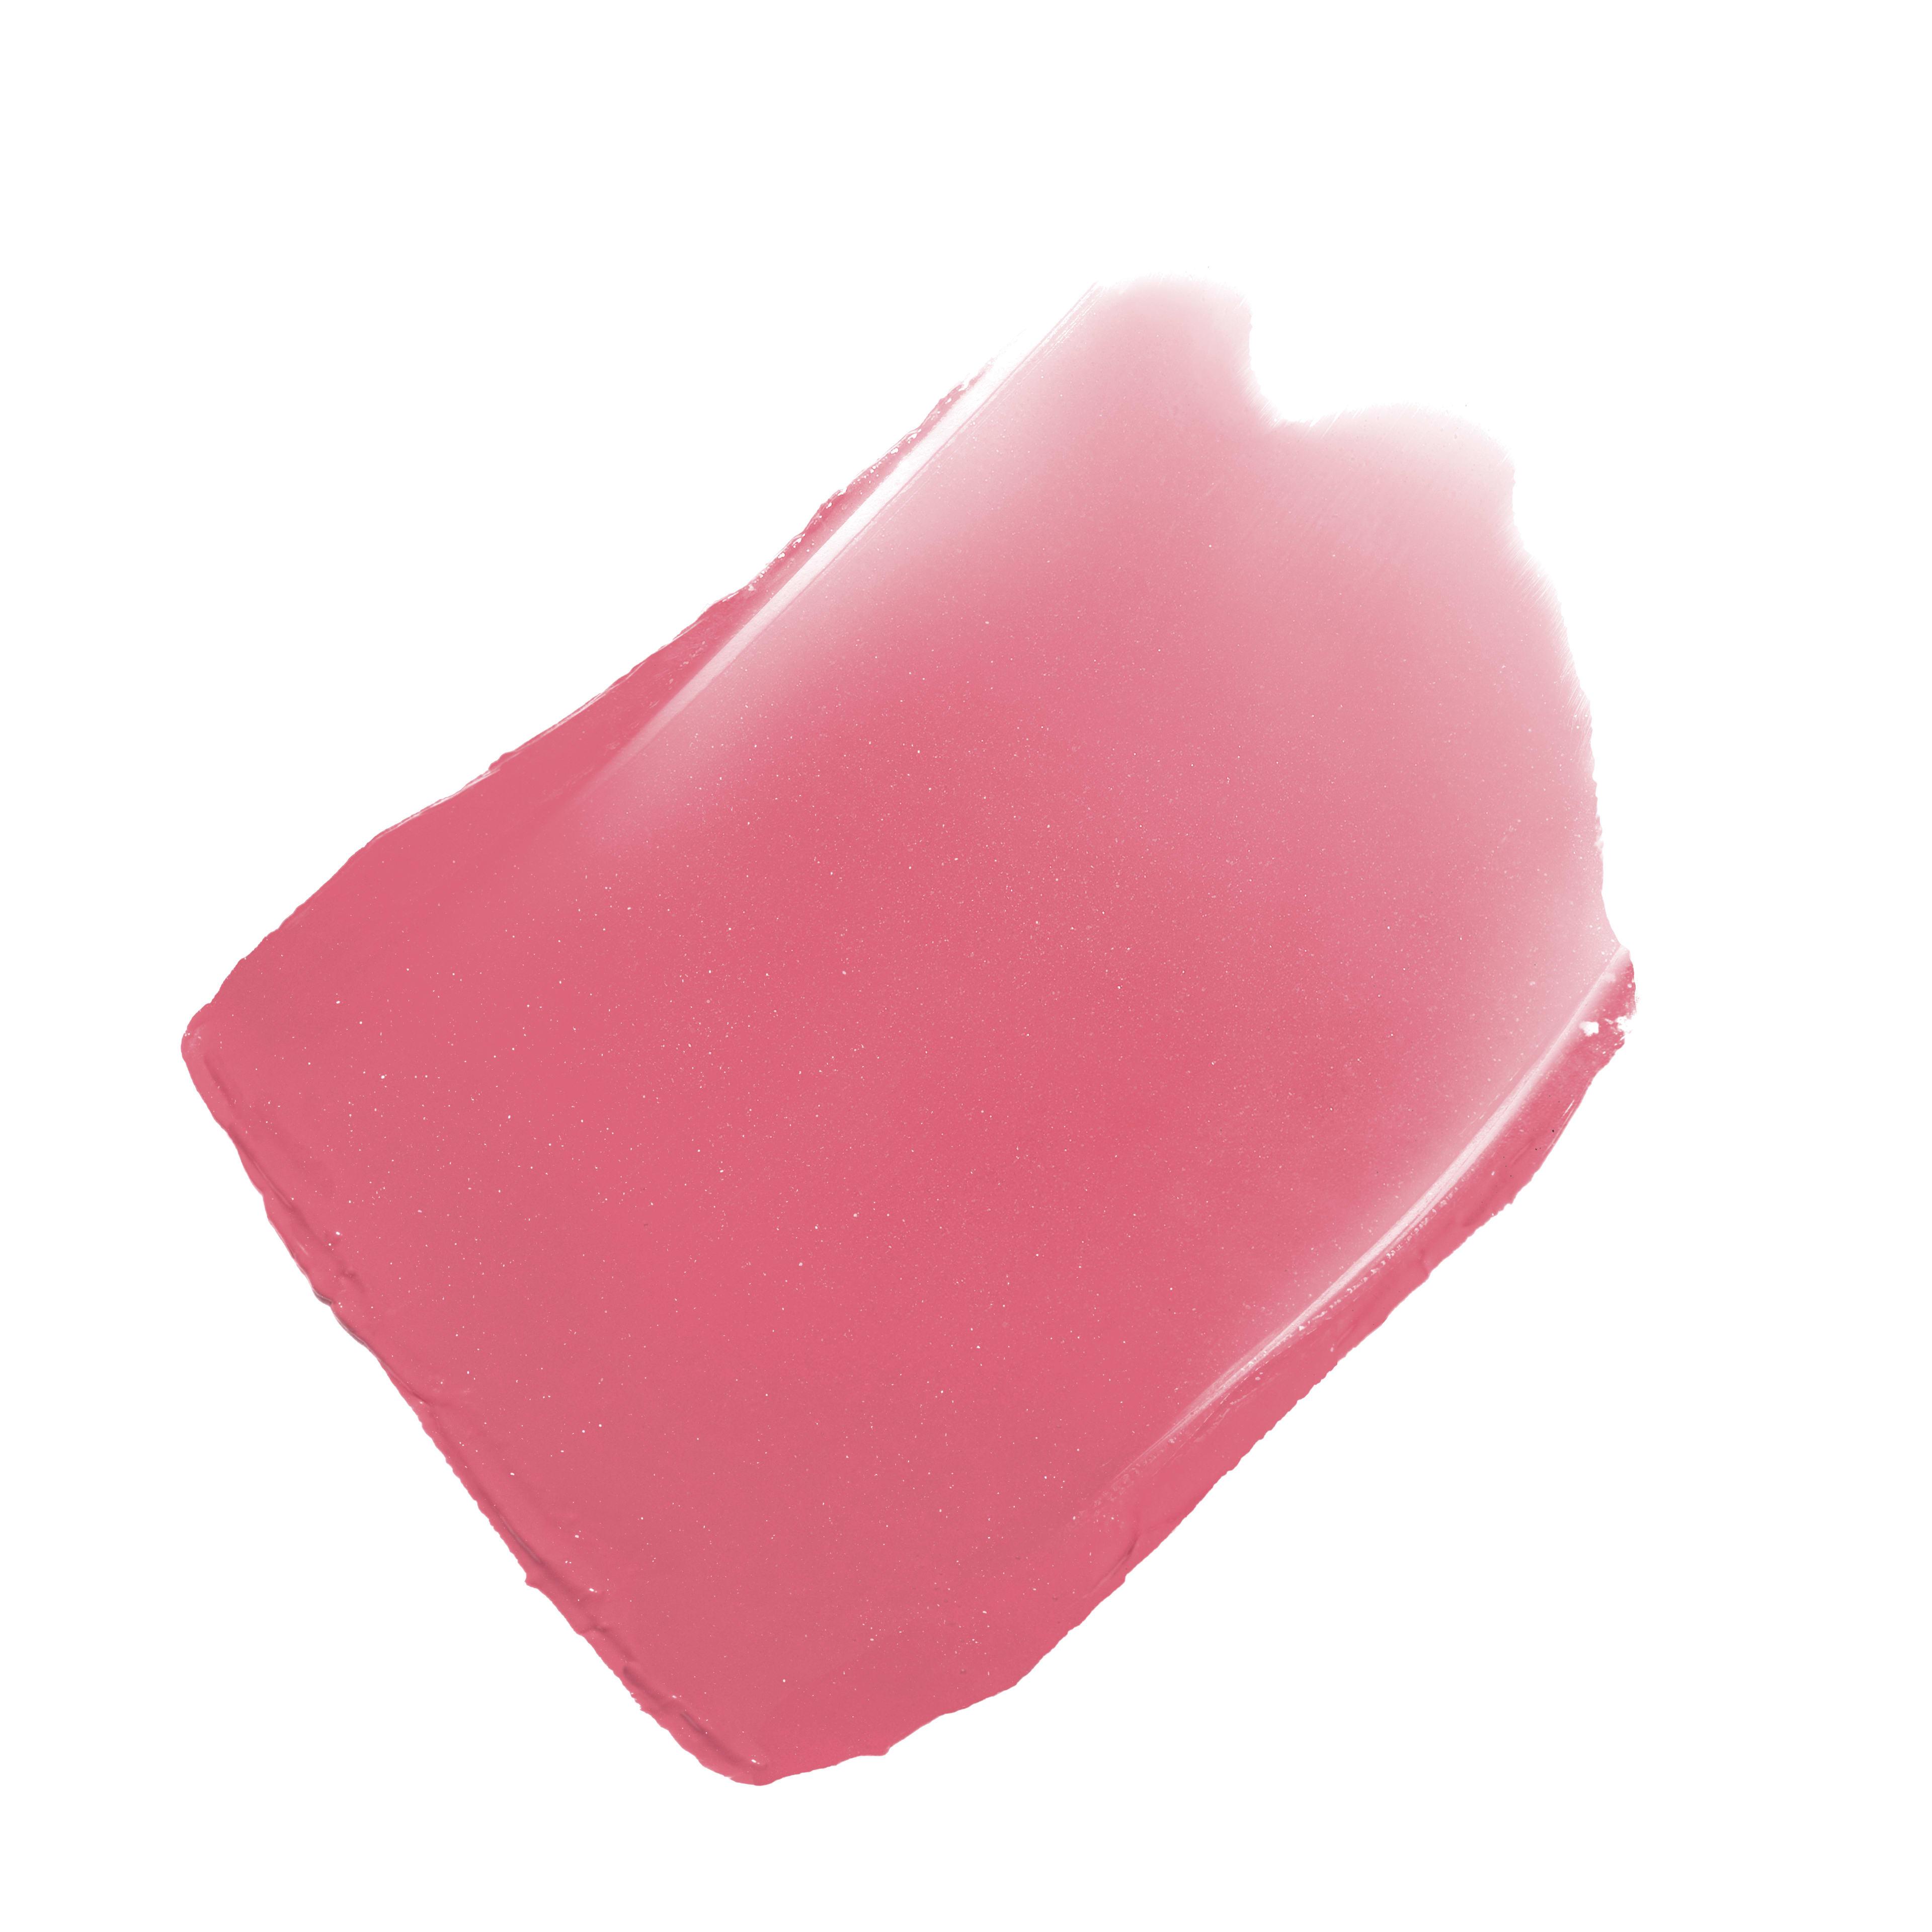 ROUGE COCO STYLO - makeup - 2g - มุมมองพื้นผิวธรรมดา